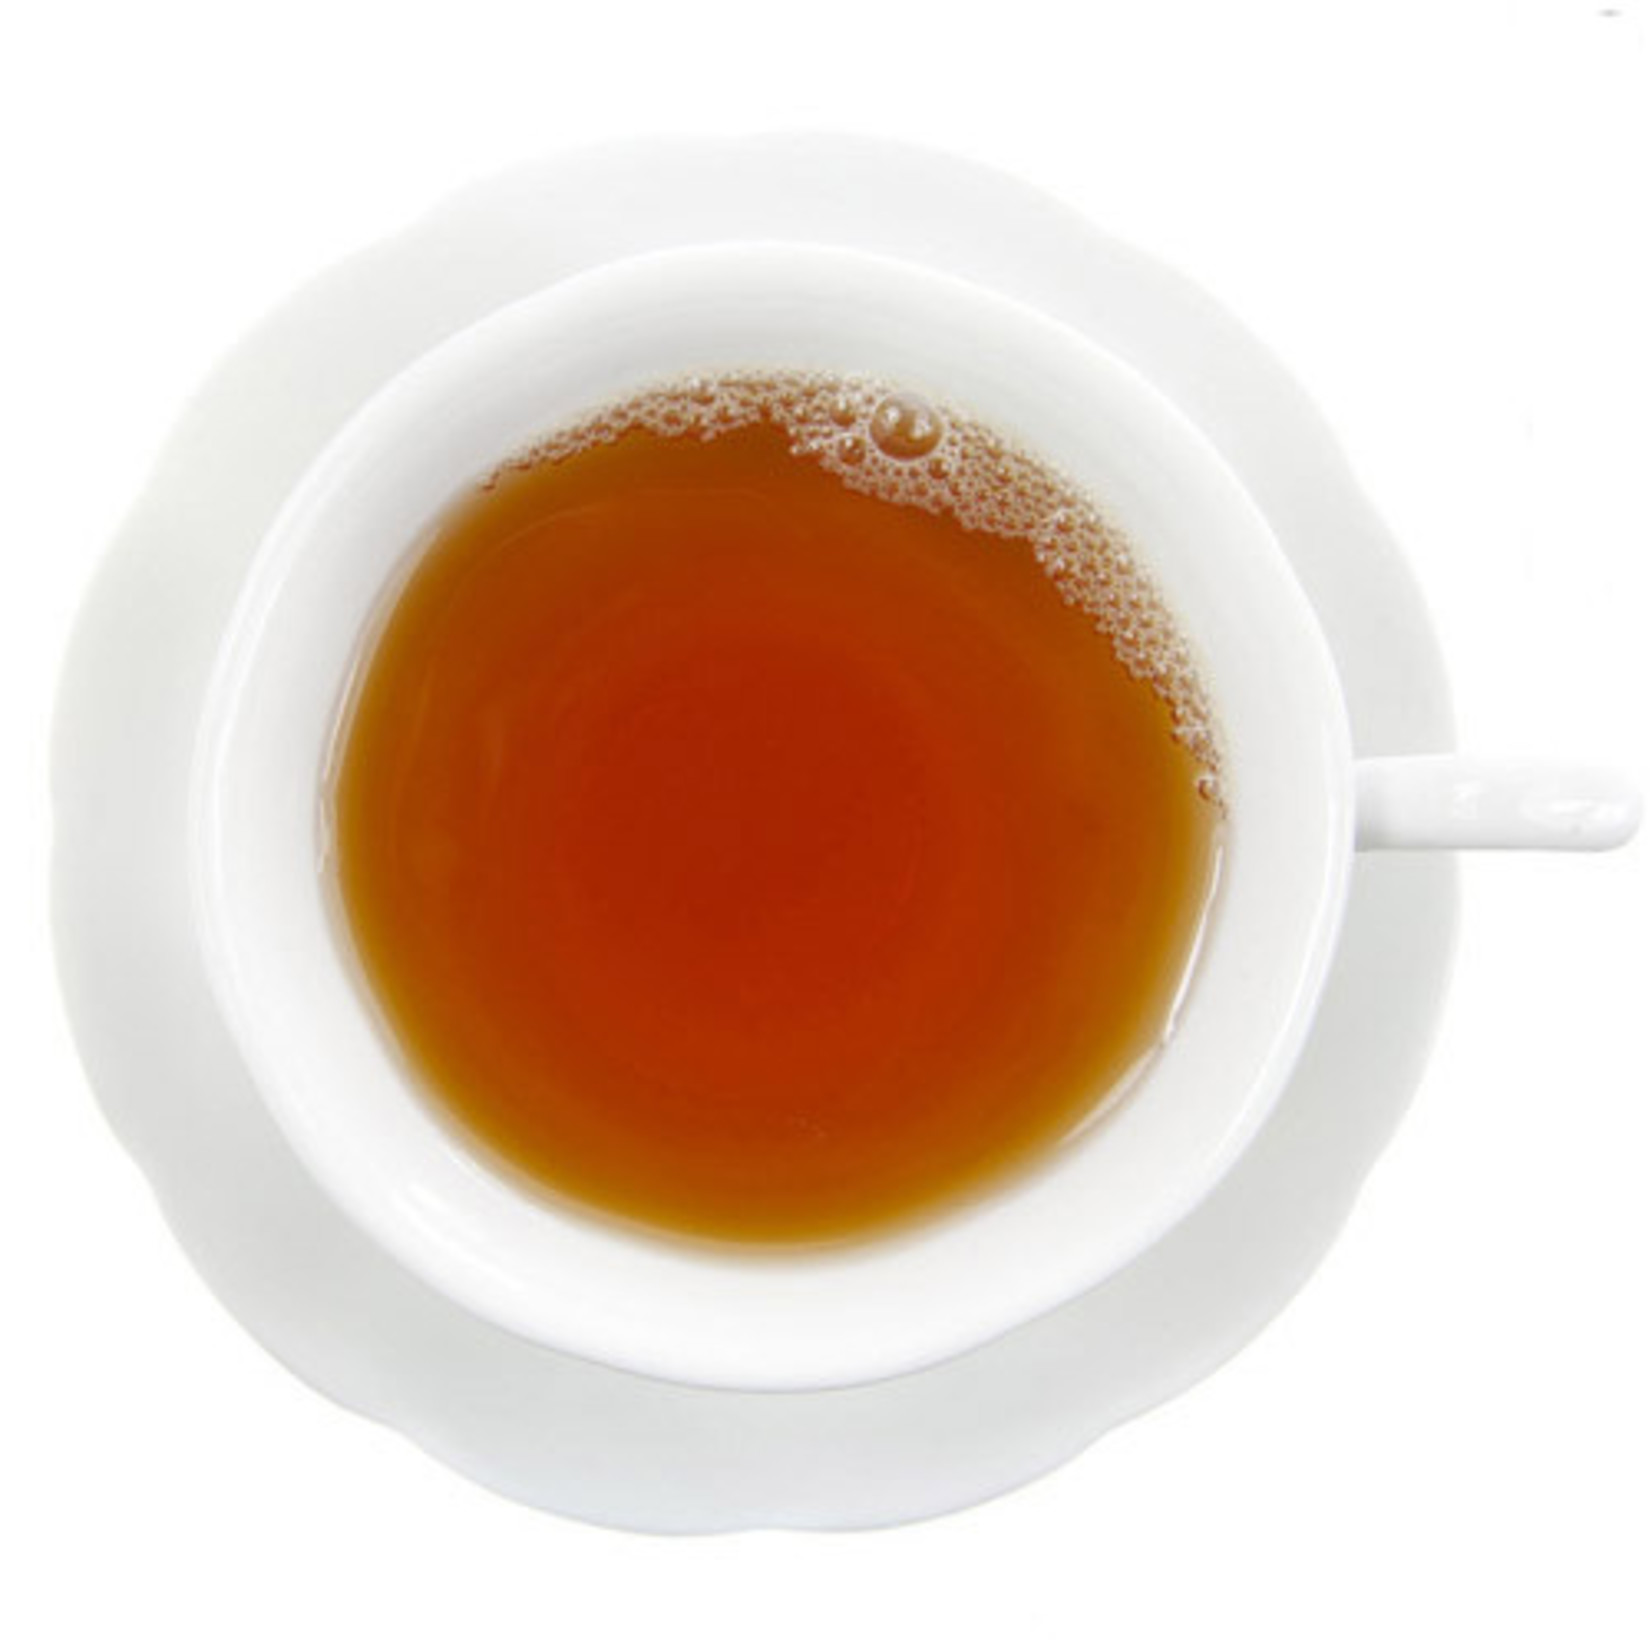 BrewBakers Tea English Breakfast LARGE 250g